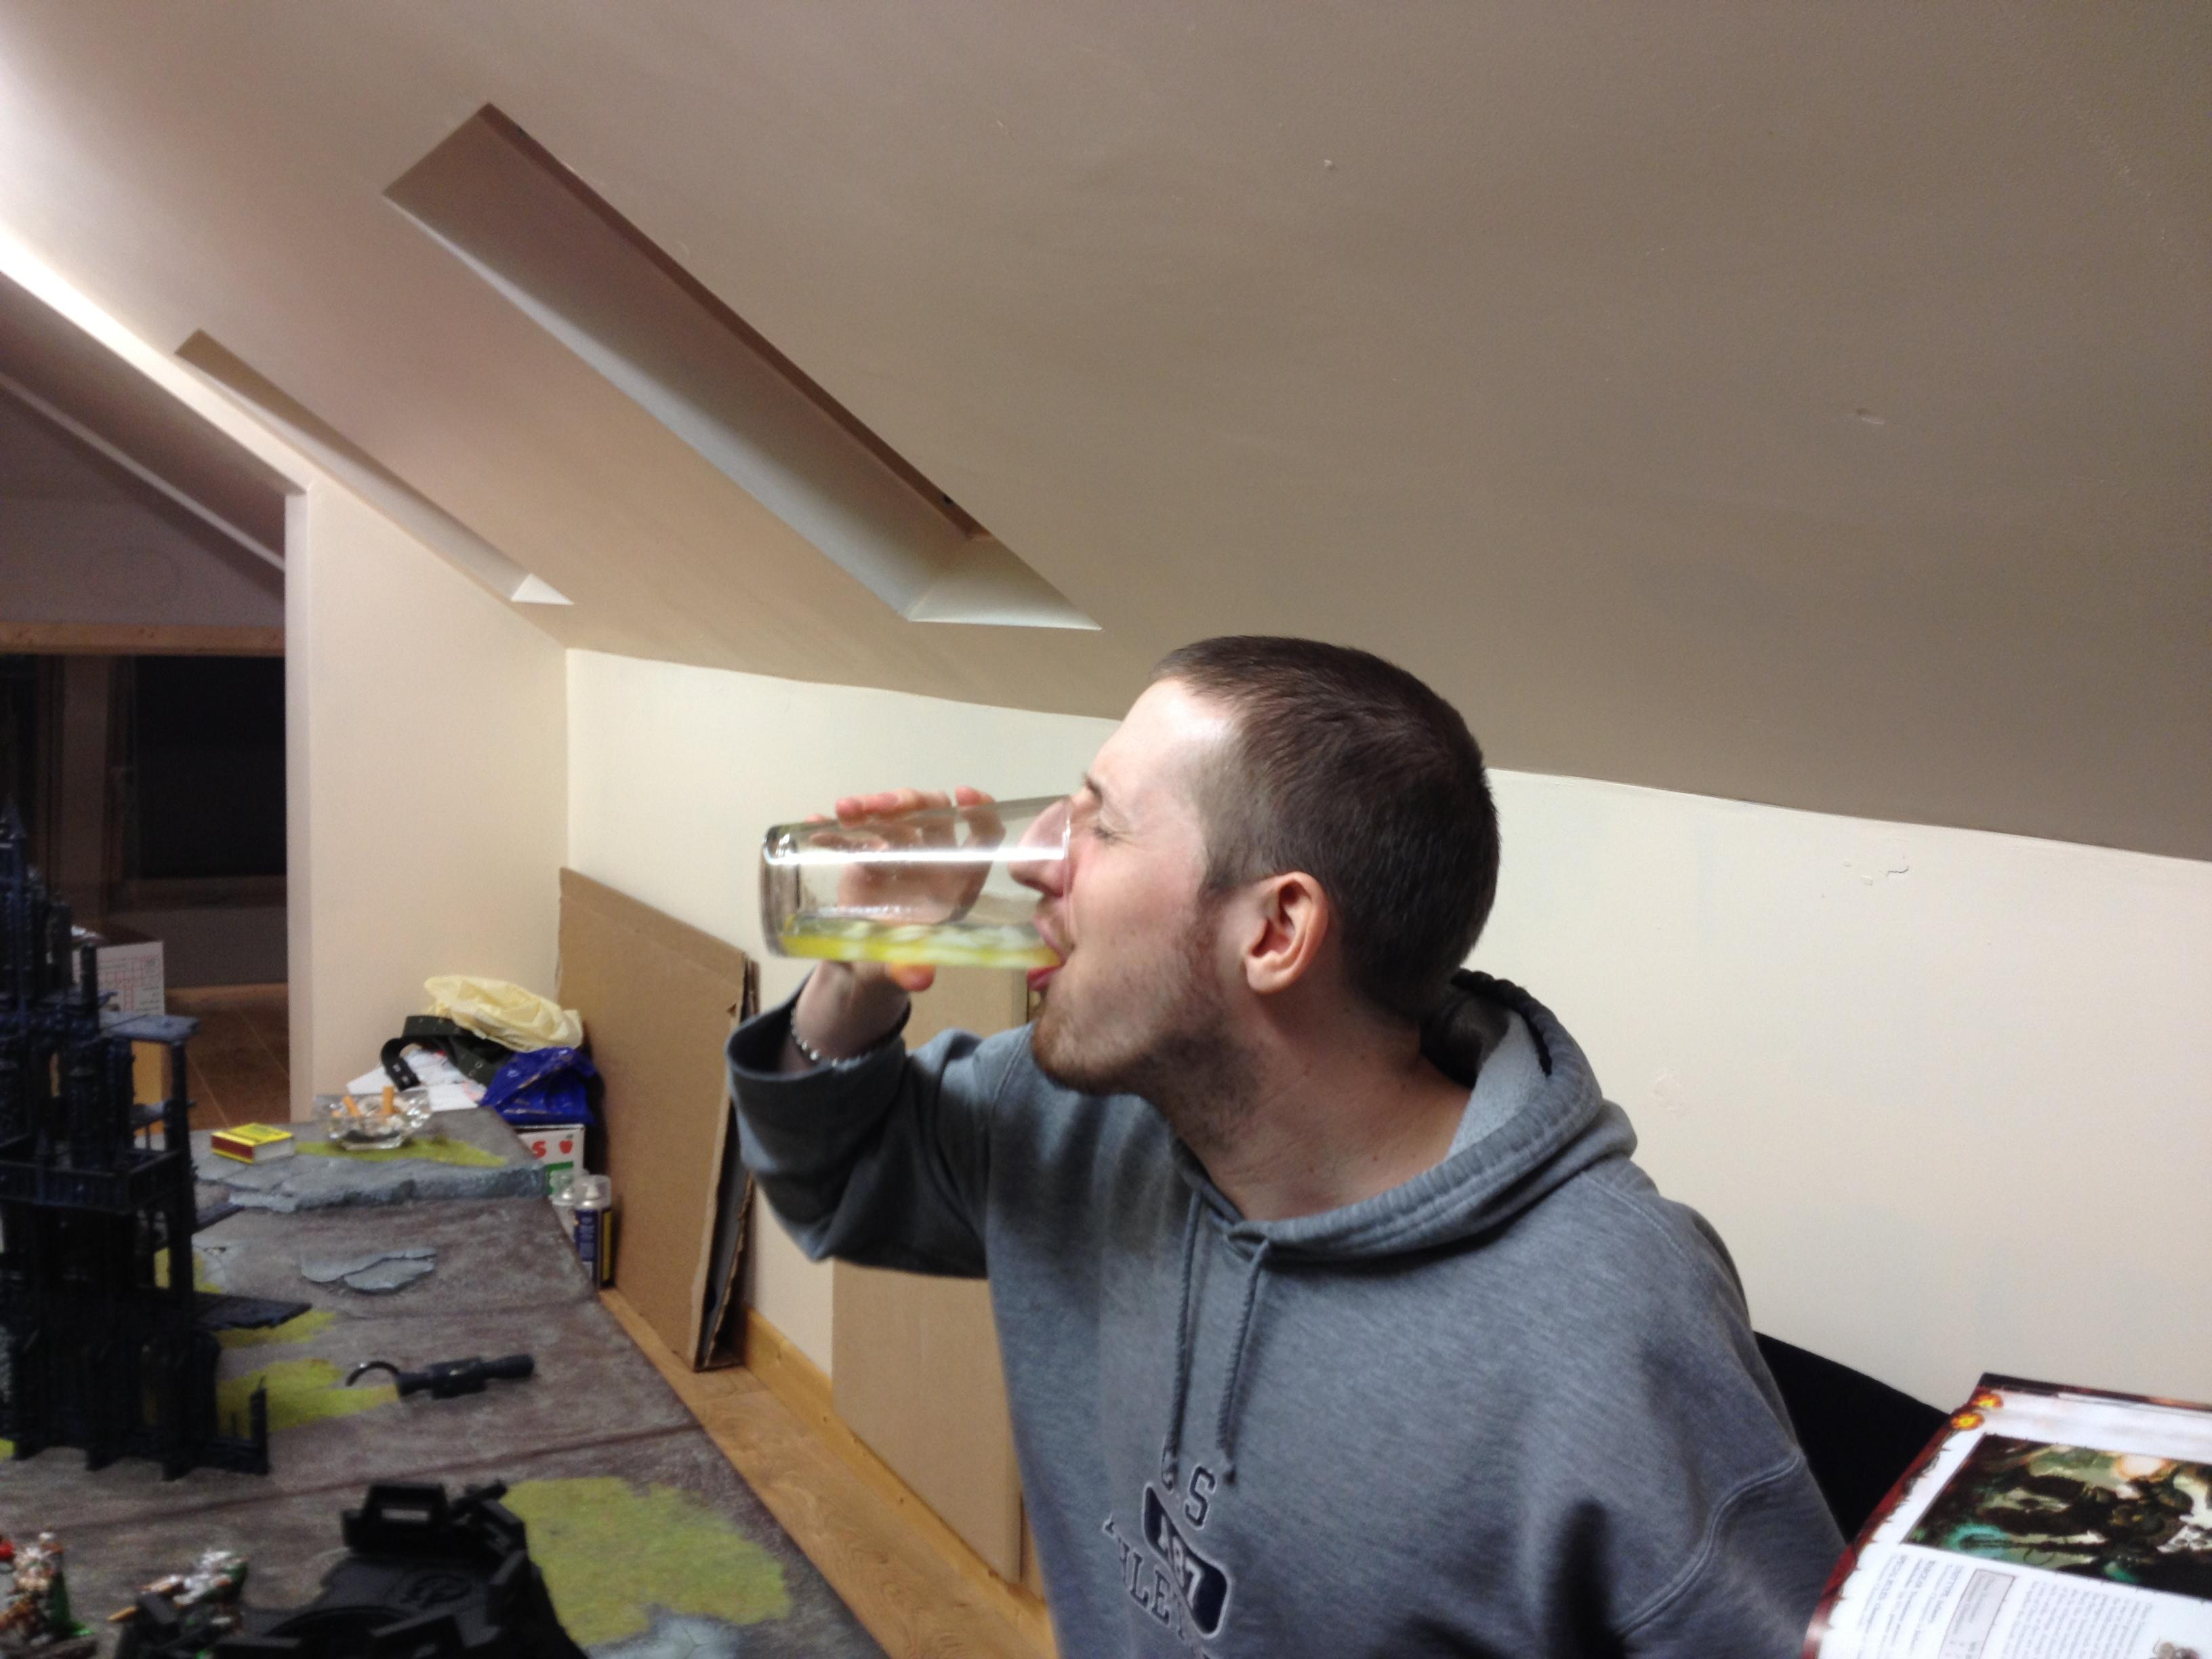 #rockdathoodie, Beerhammer, Chug, Do The Dew